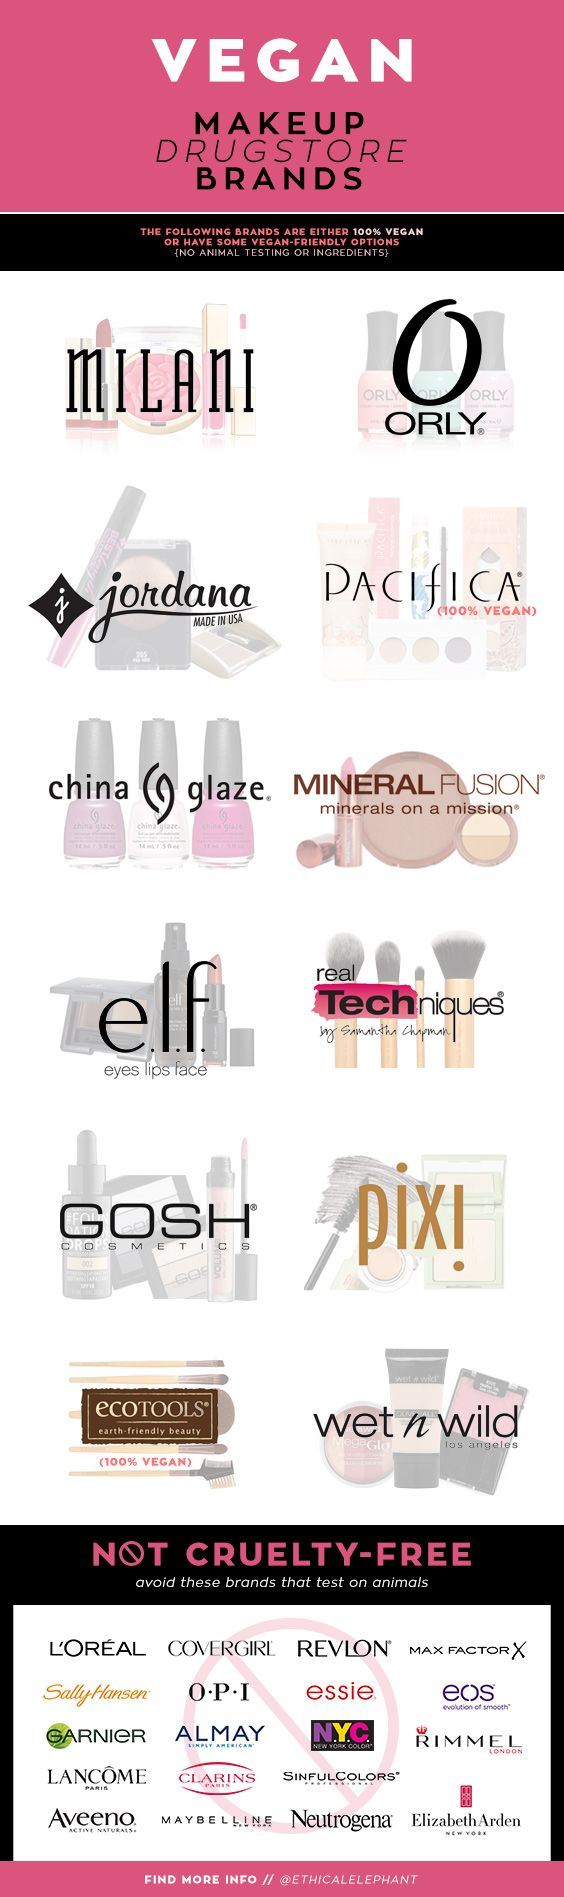 Cruelty Free Vegan Makeup Affordable Drugstore Brands Vegan Makeup Cruelty Free Cosmetics Cruelty Free Makeup